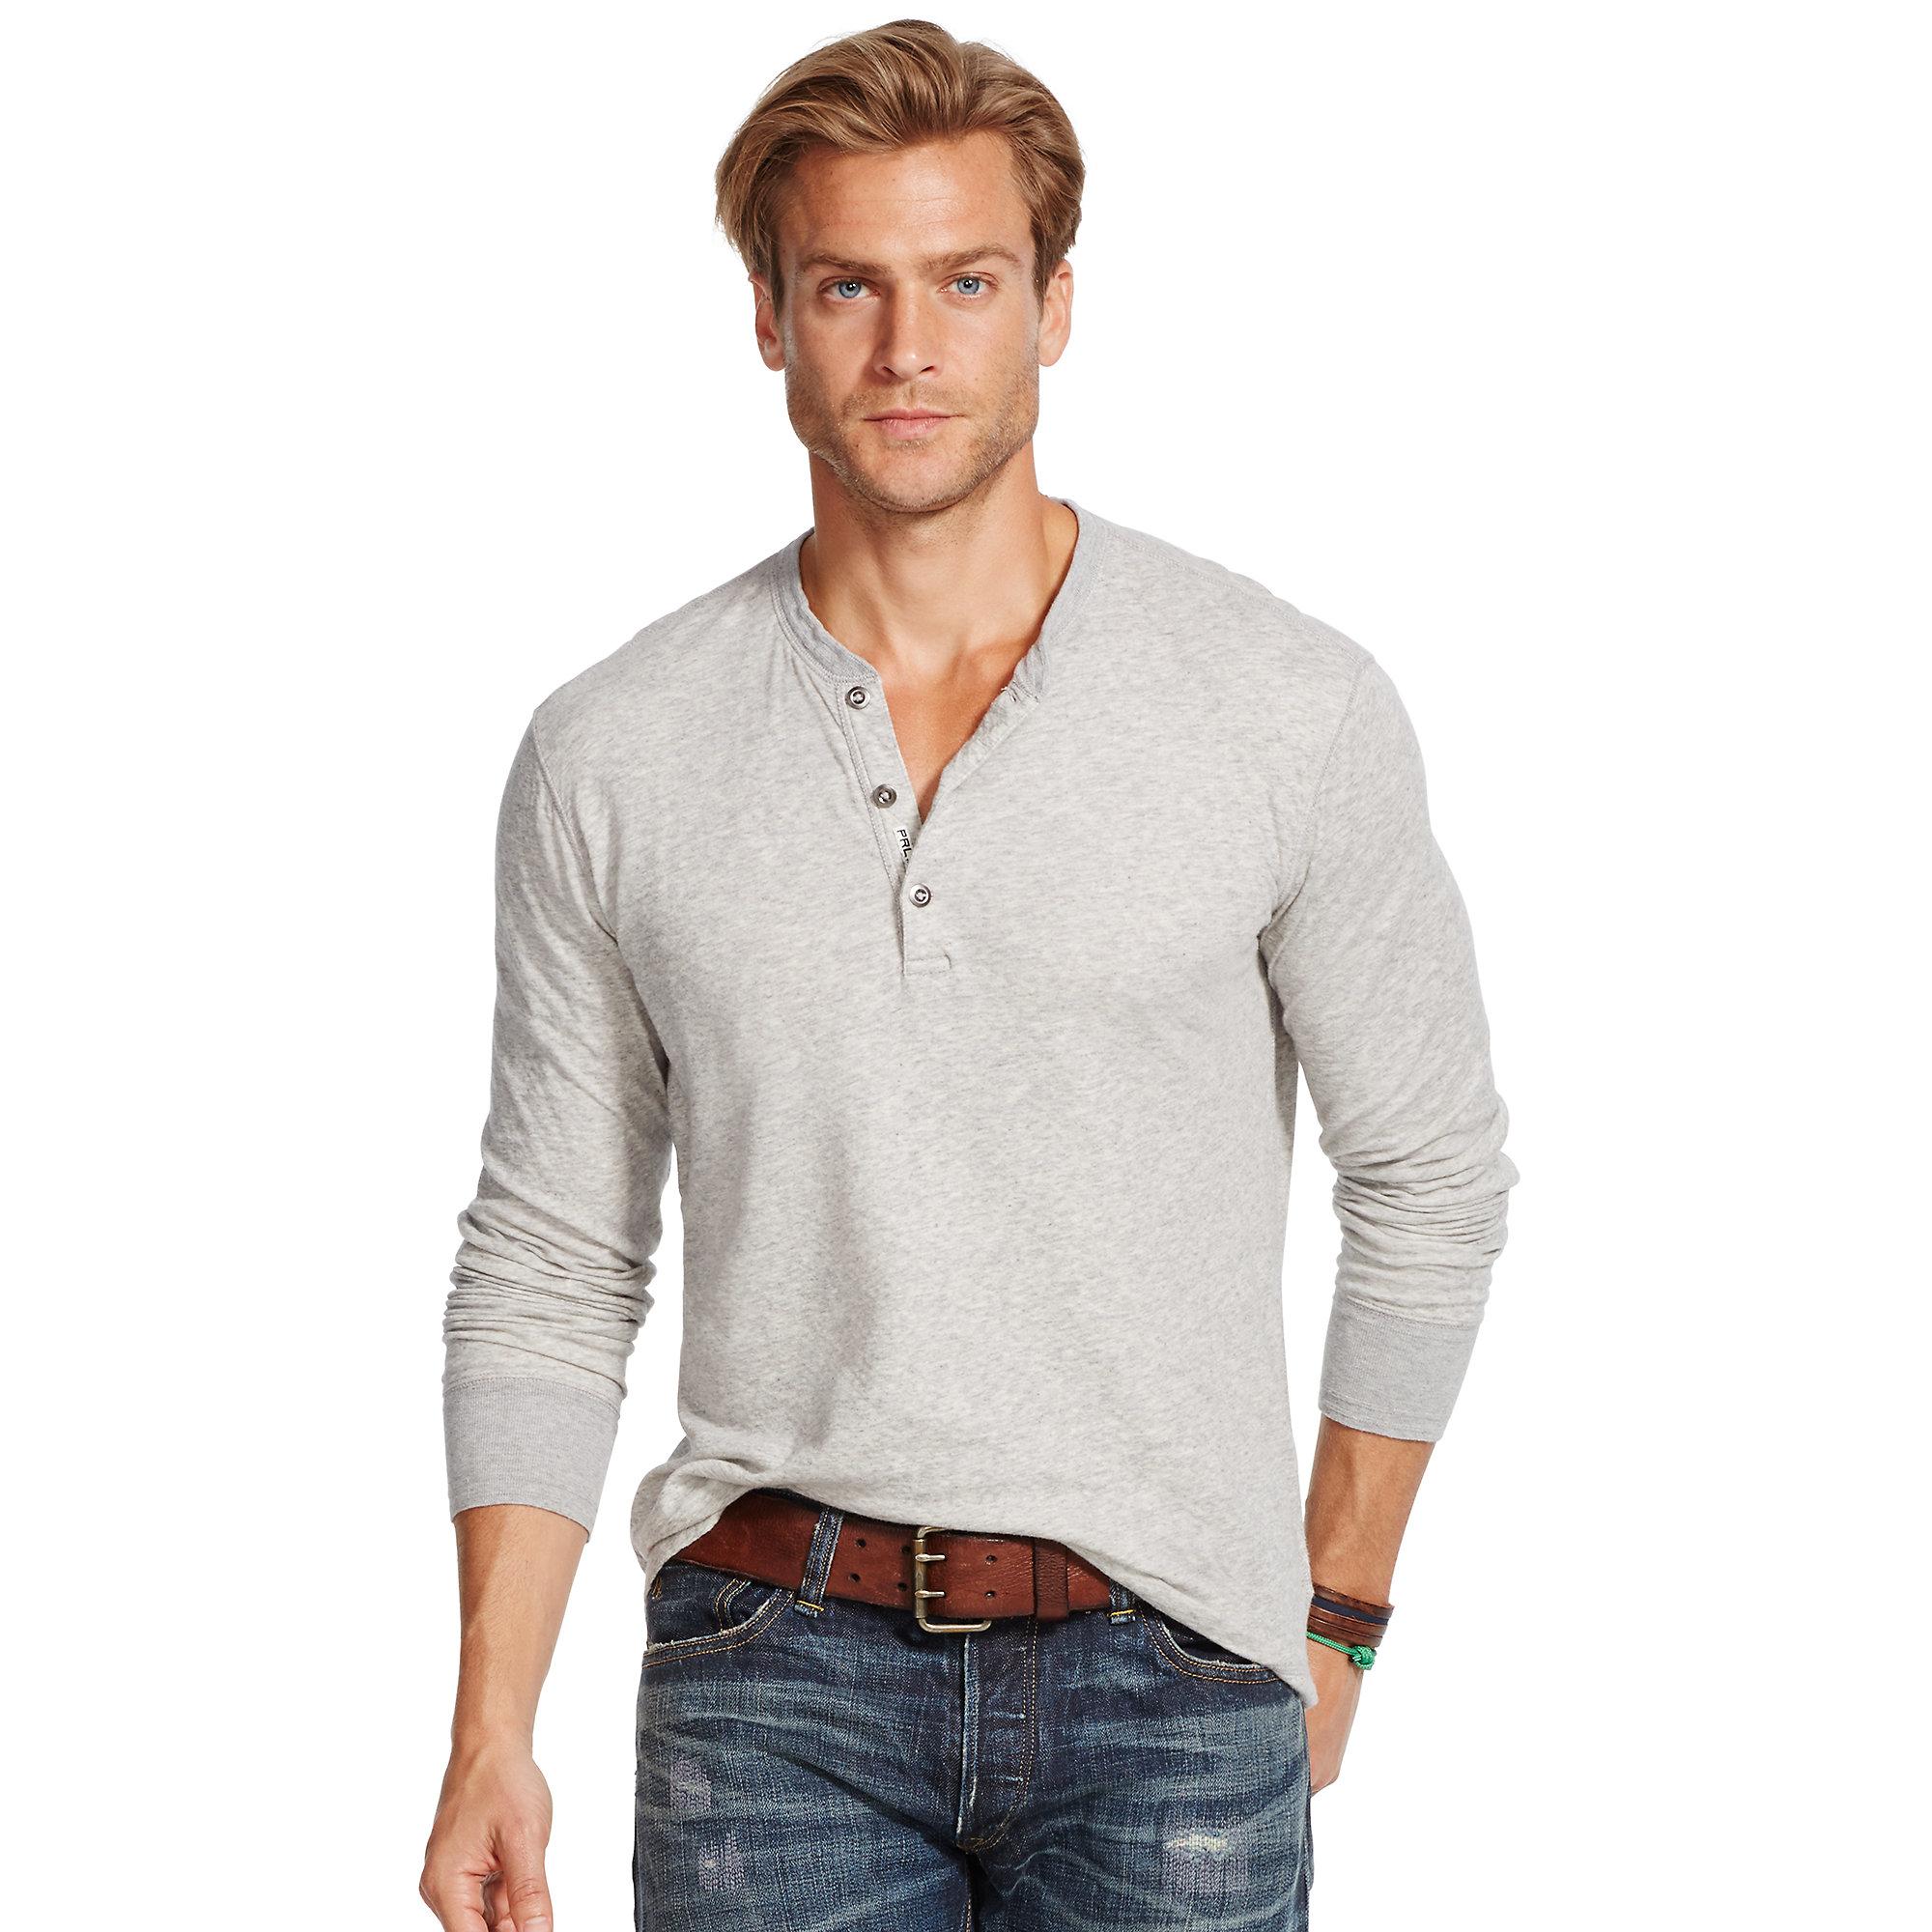 Cotton Men Henley Gray Ralph Lauren Polo Jersey For lT1KFJc3